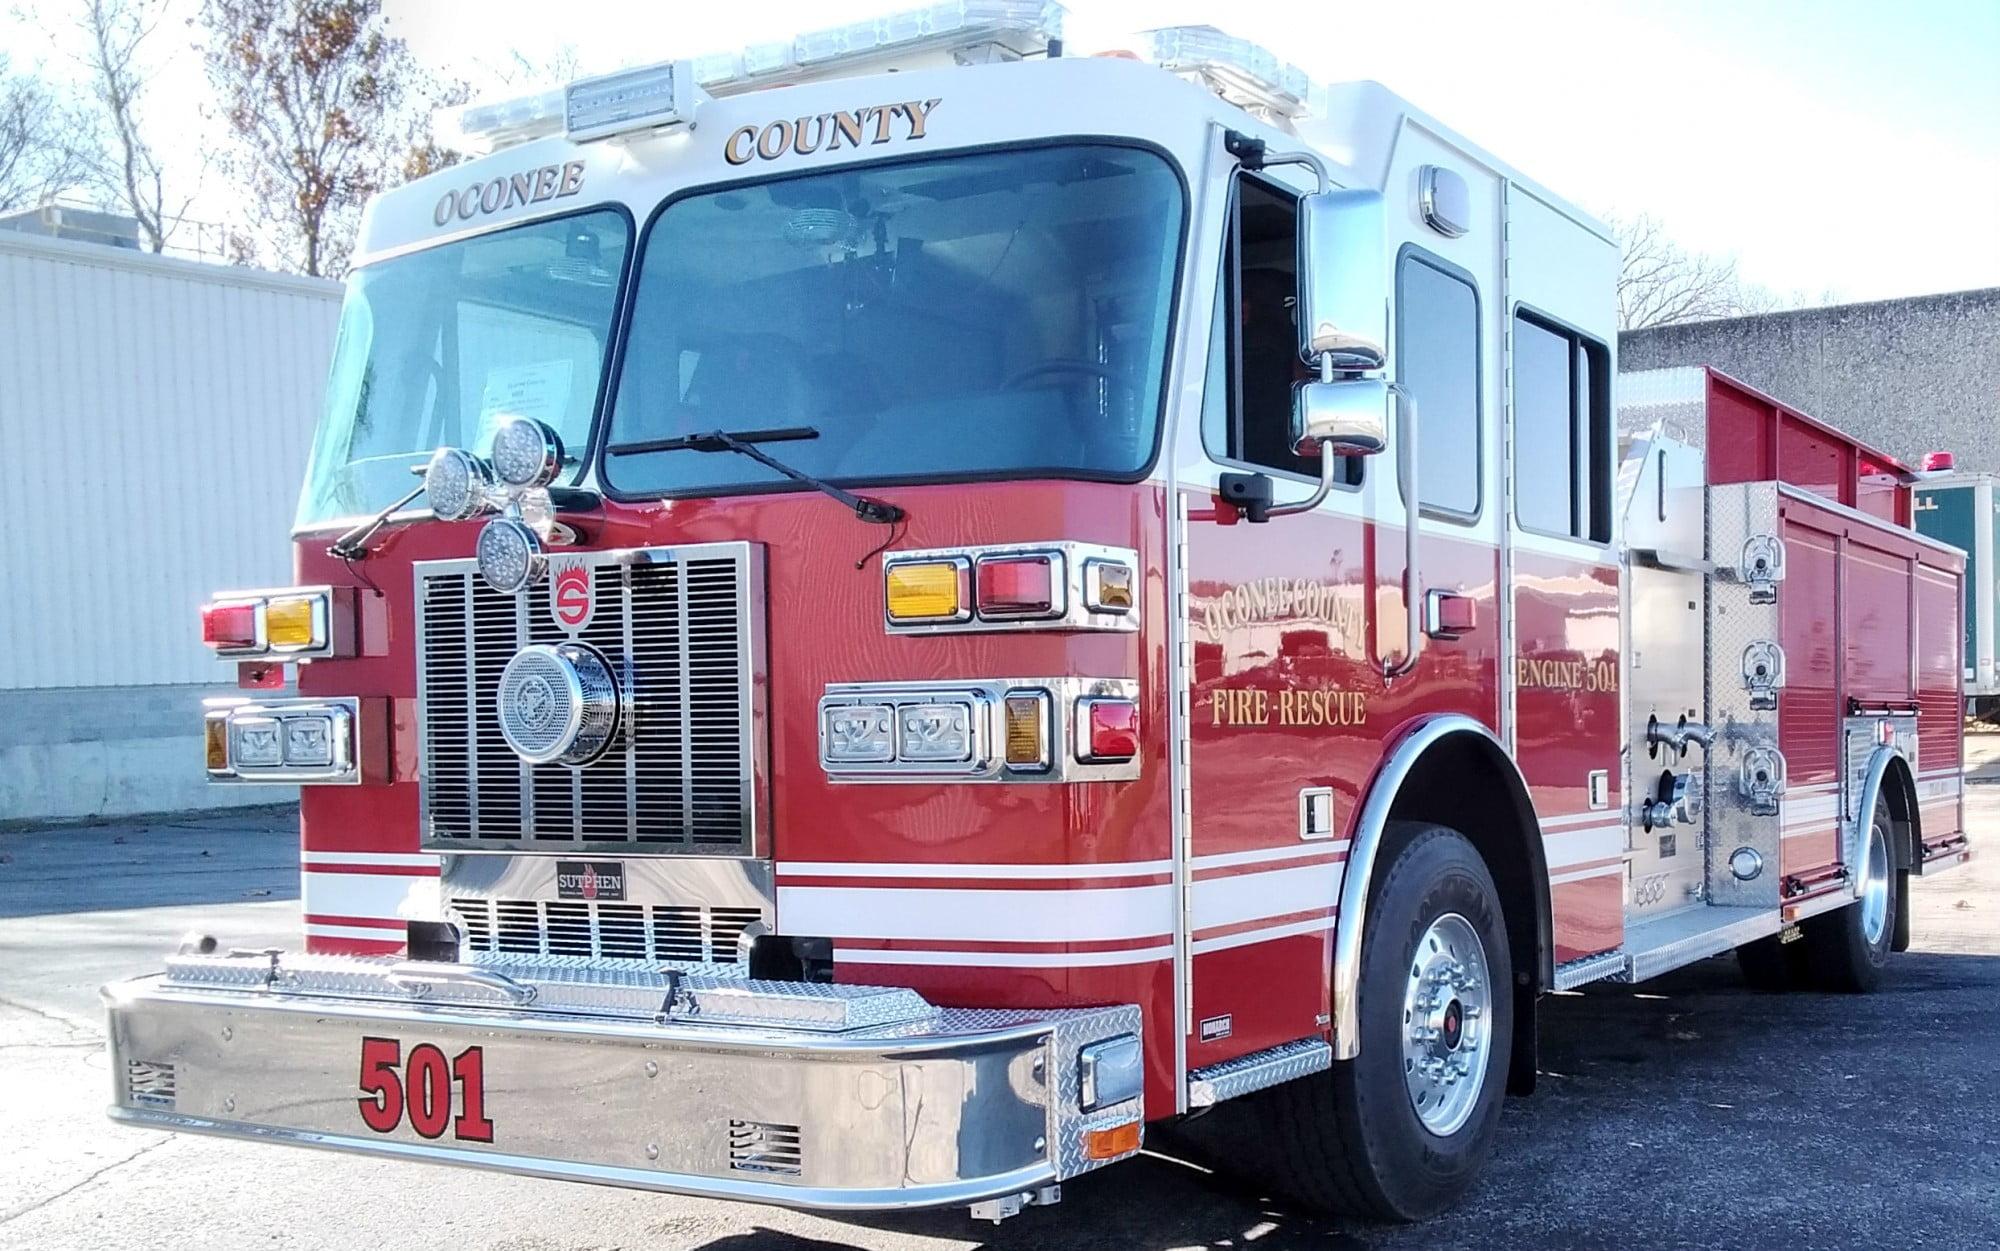 Oconee County Fire Rescue